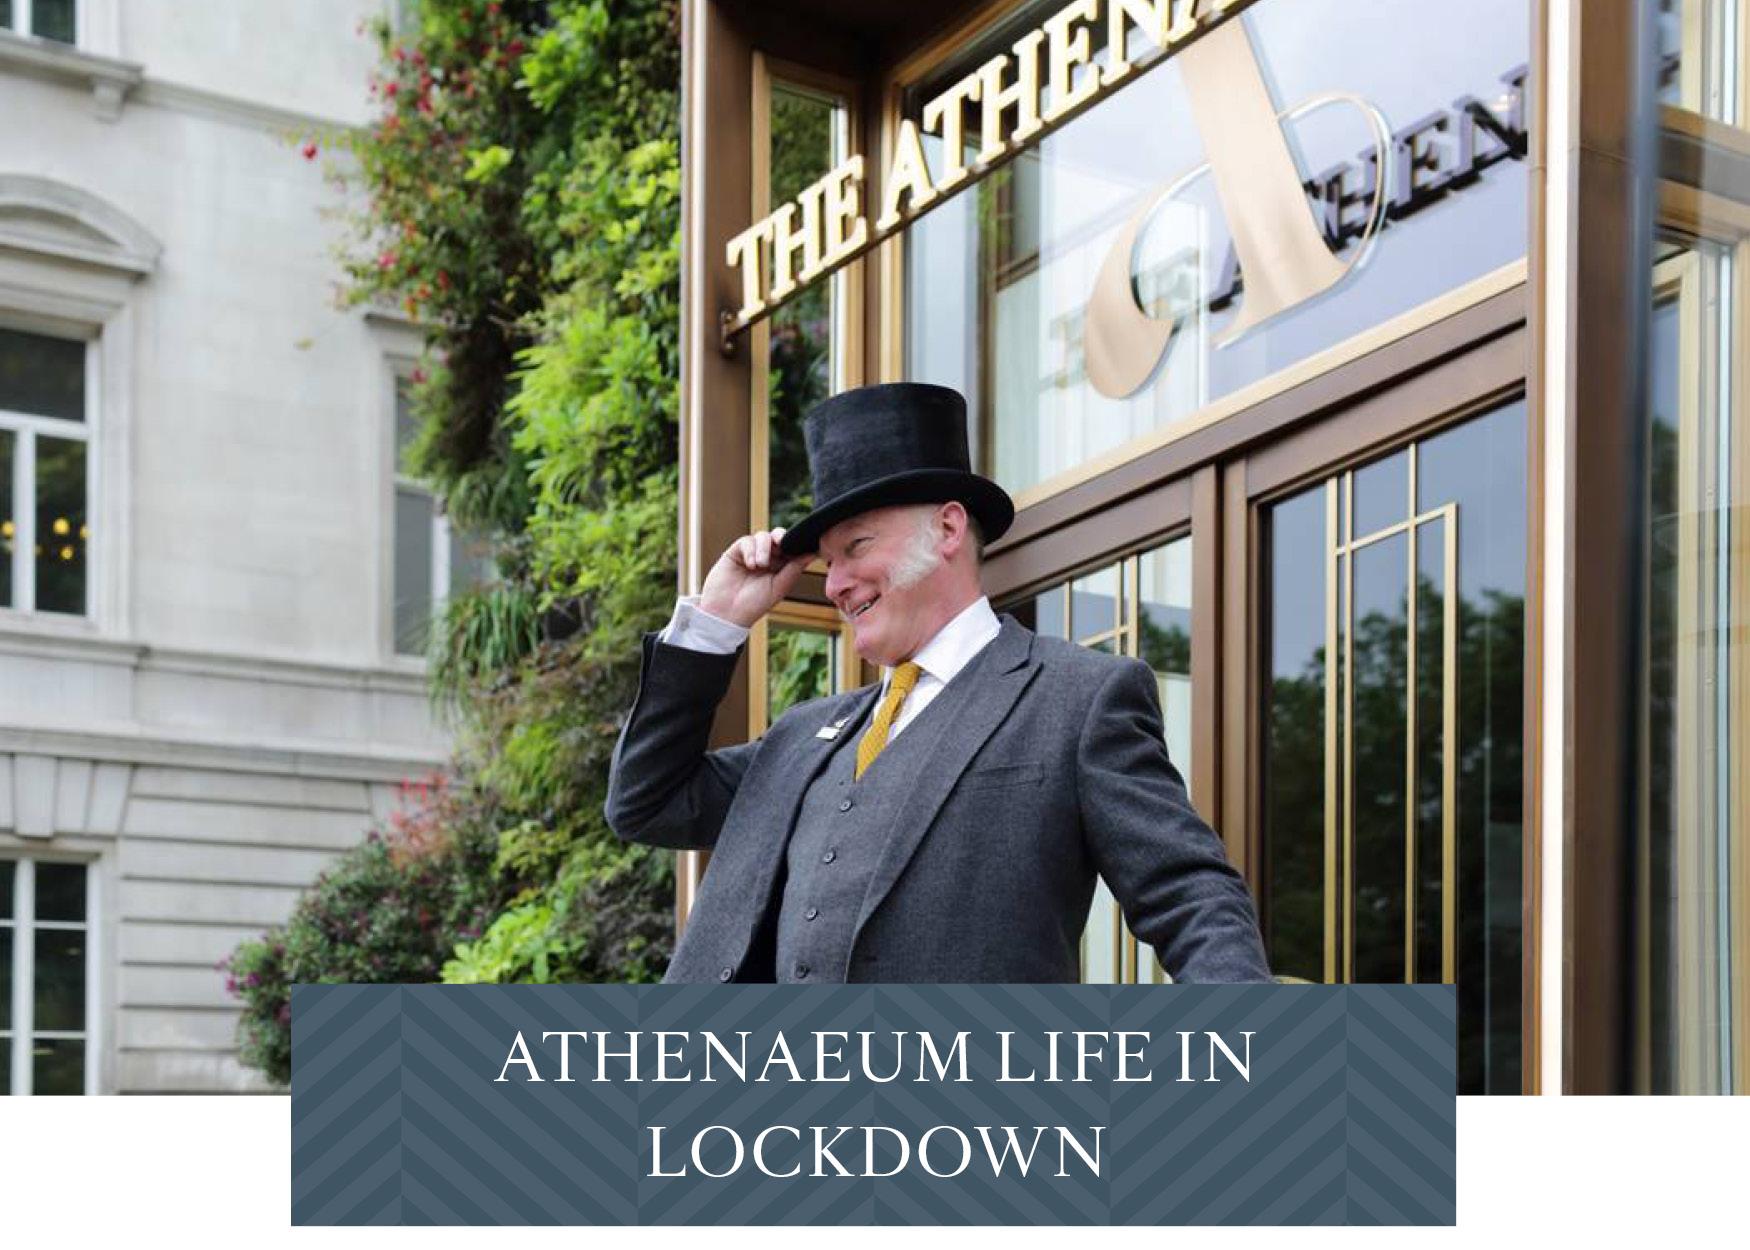 April at the Athenaeum